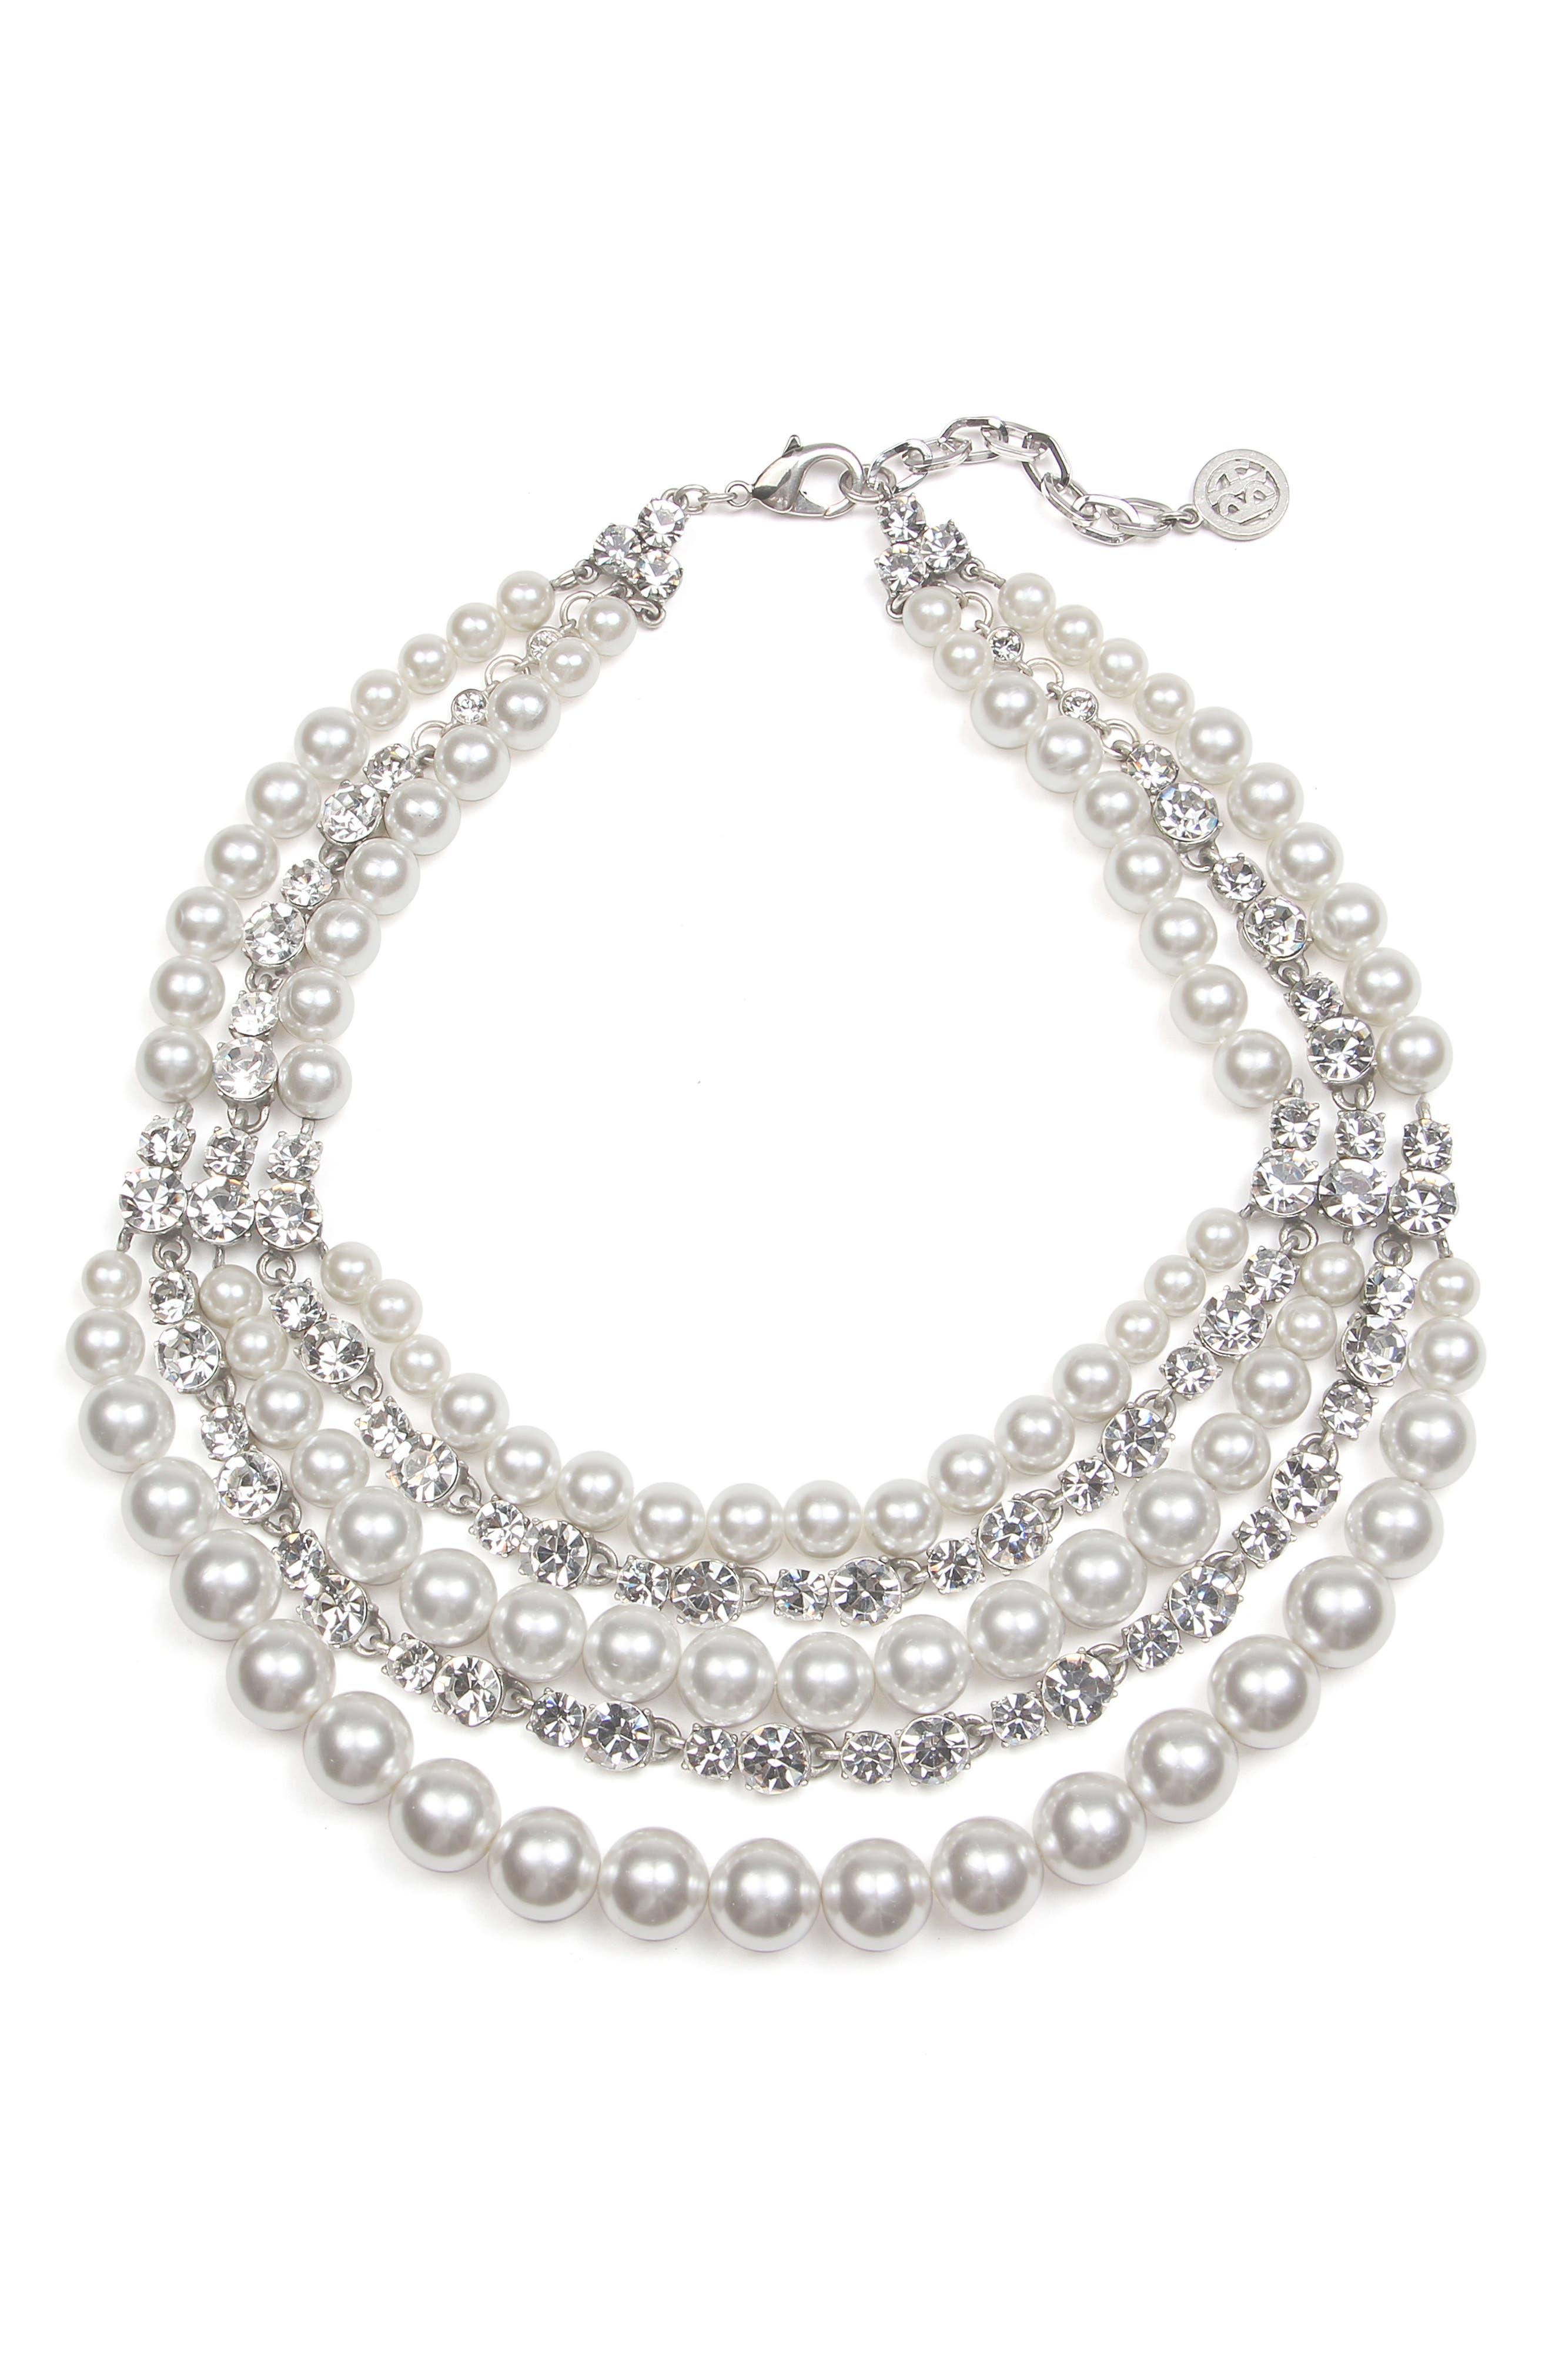 Crystal & Imitation Pearl Multistrand Torsade Necklace,                             Main thumbnail 1, color,                             SILVER/ BEIGE